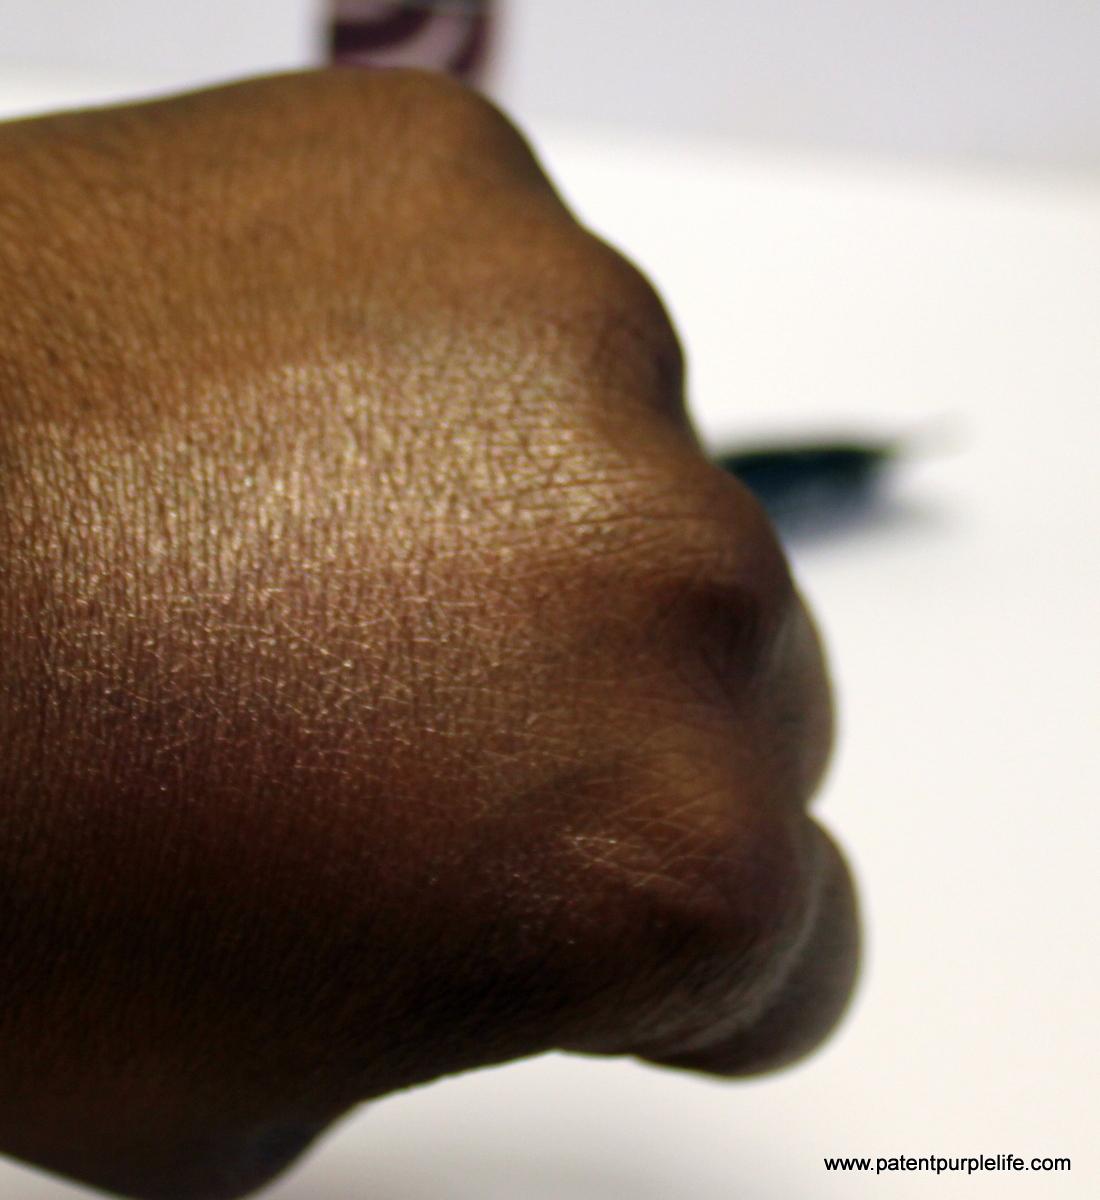 Ciate Cooling Eyeshadow Slick Daquiri Dark Skin Swatch